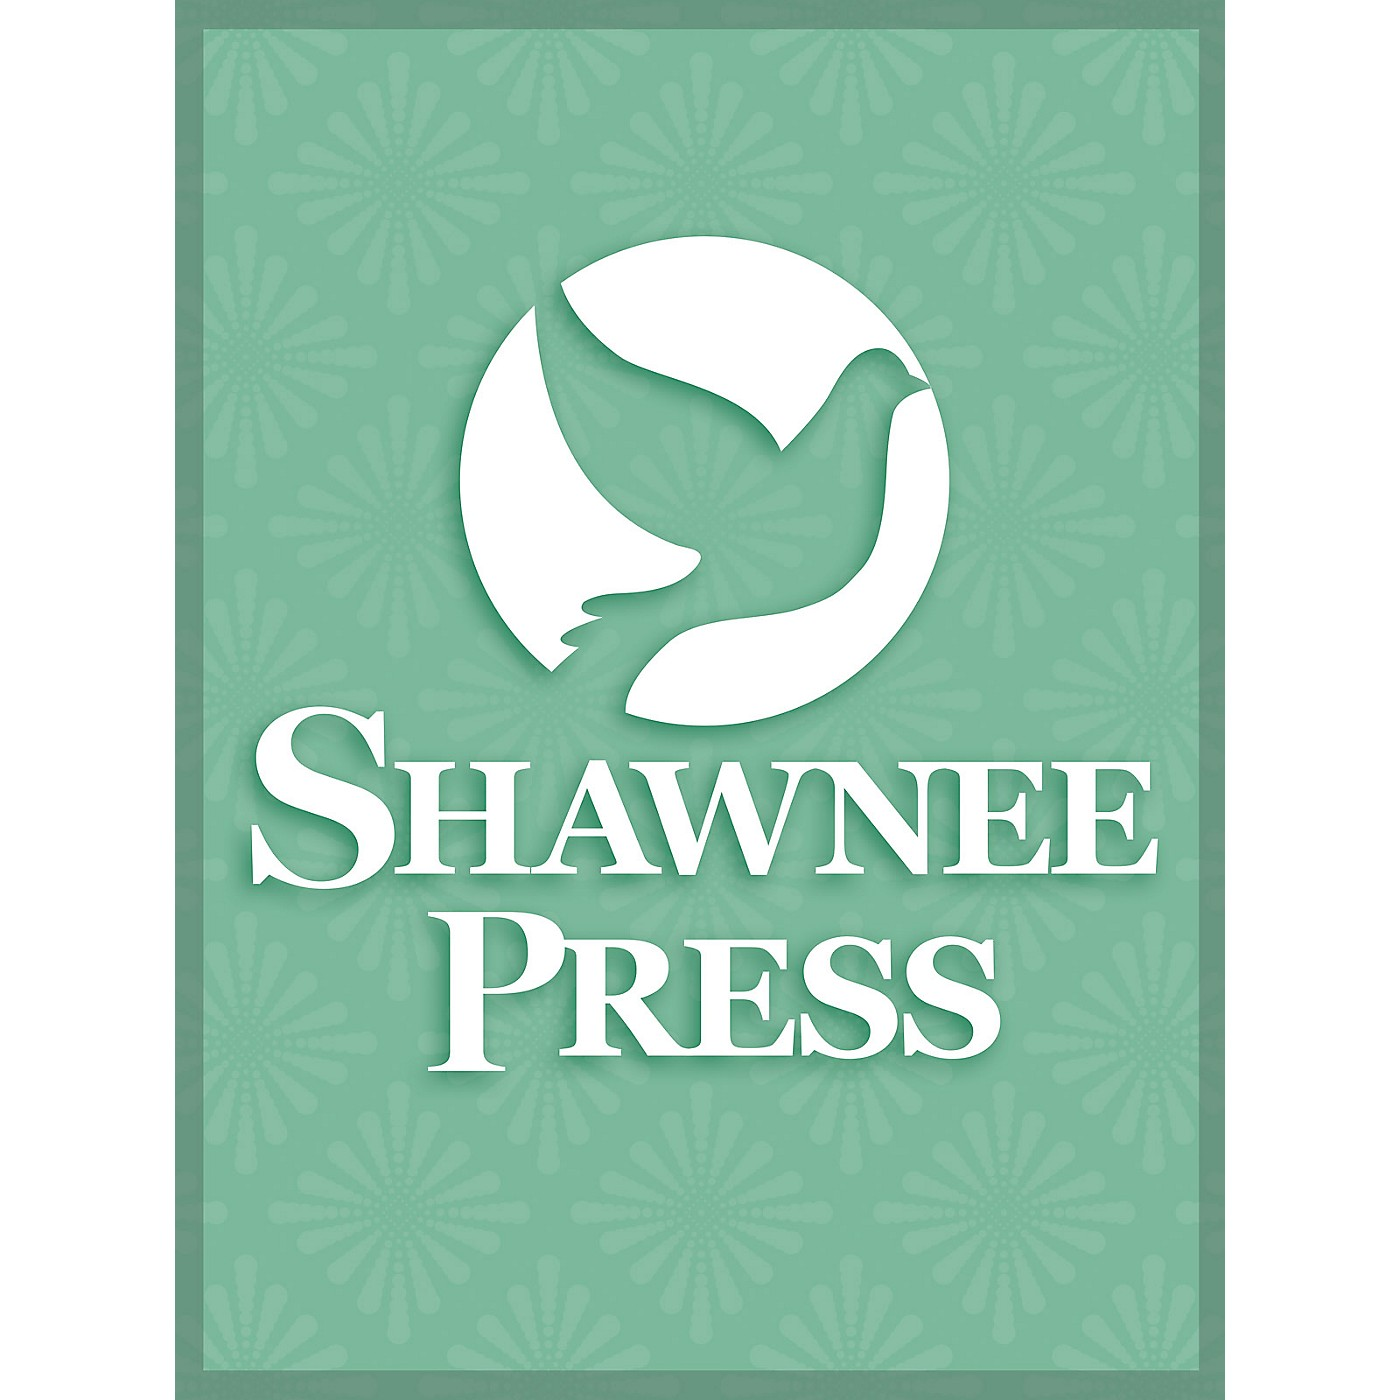 Shawnee Press Tanzen und Springen SATB a cappella Arranged by John Leavitt thumbnail